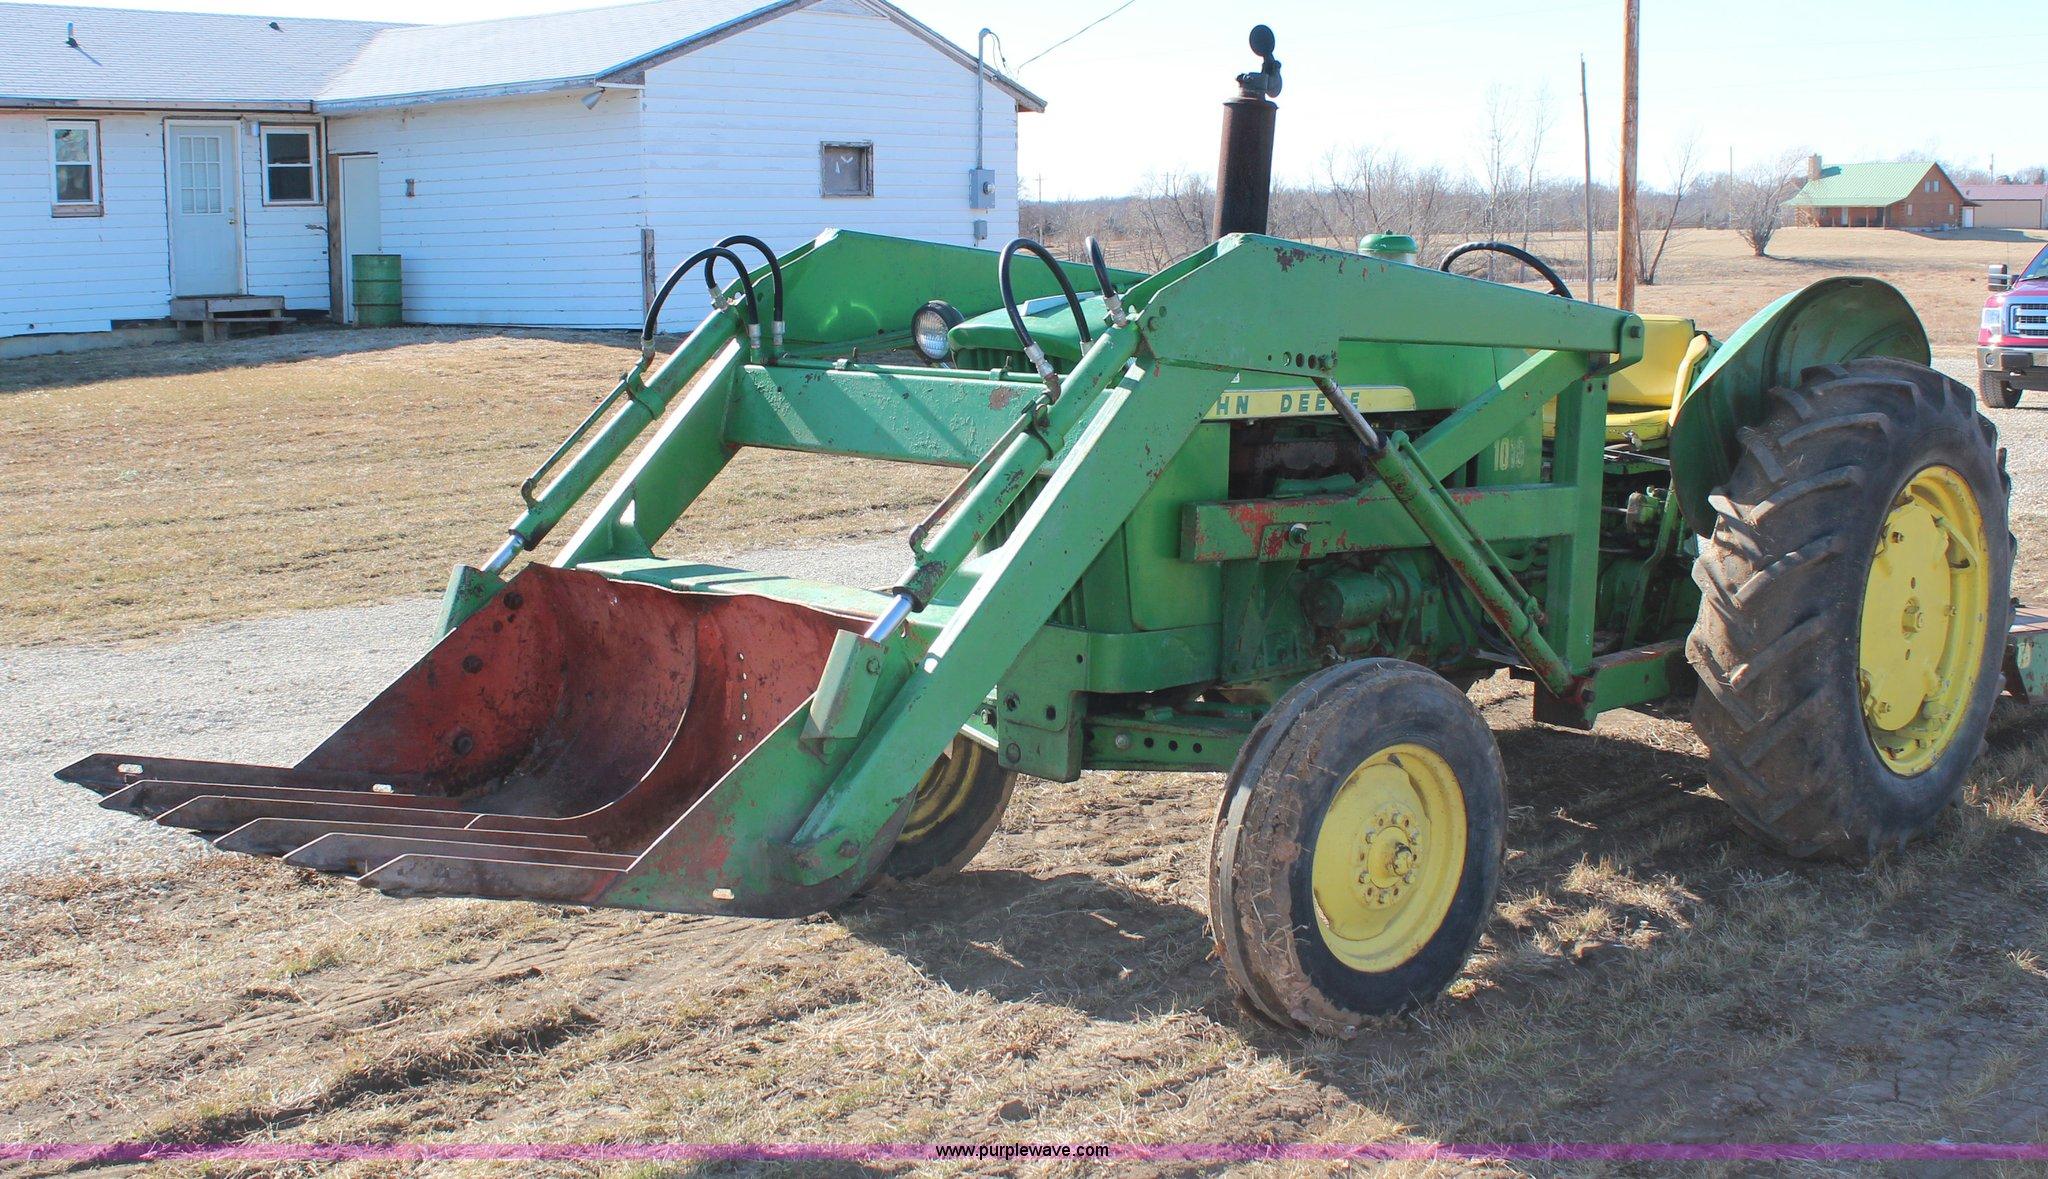 H1300 image for item H1300 1961 John Deere 1010 tractor ...